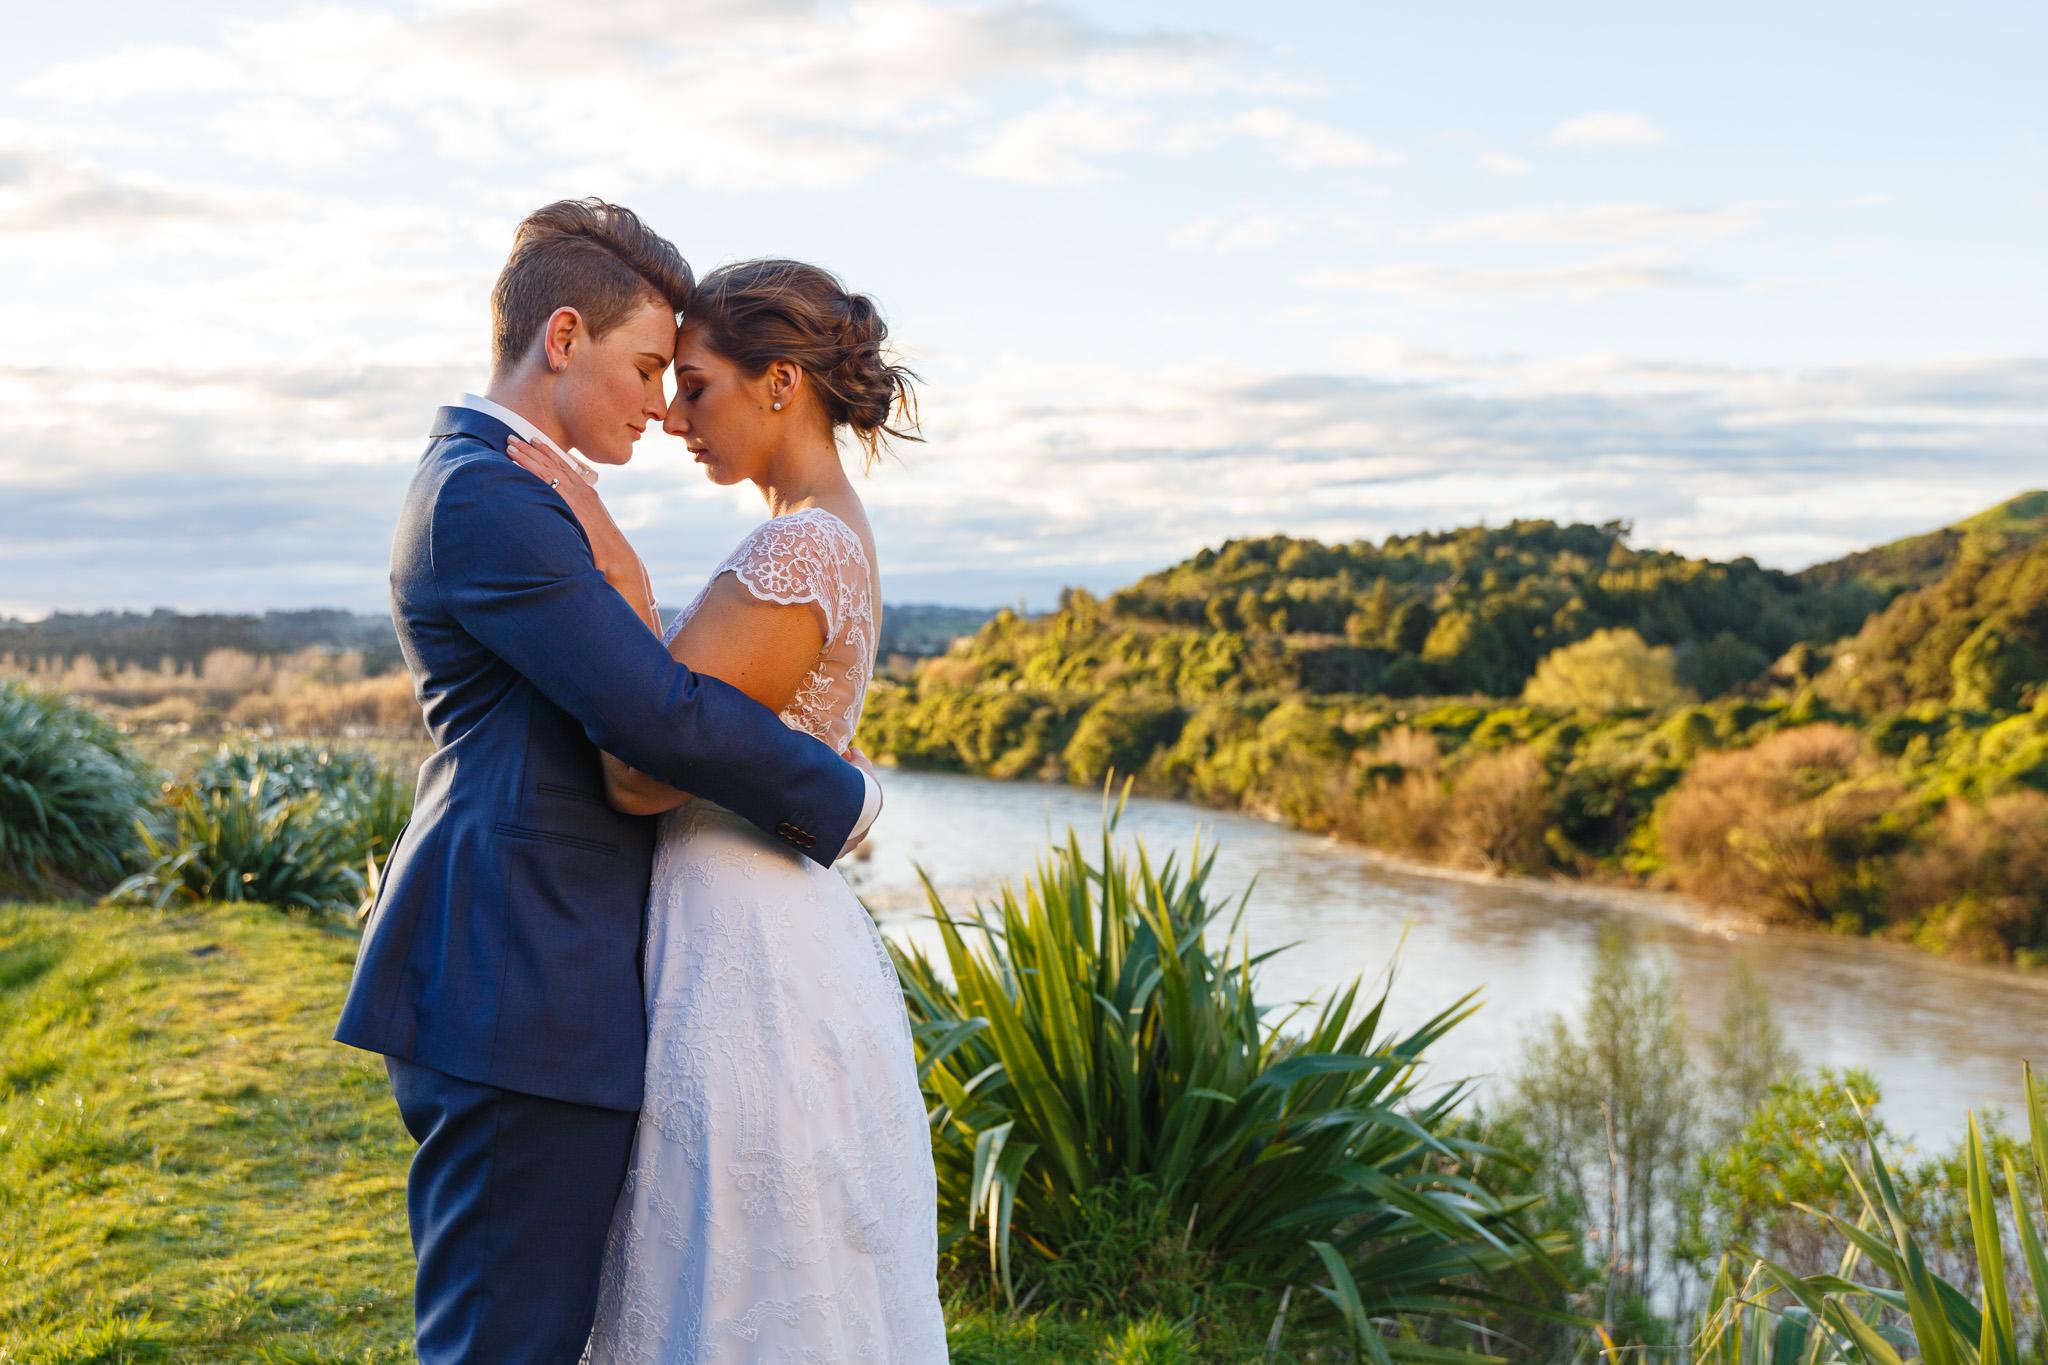 palmerston-north-wedding-photography-highlight-new-zealand.jpg-542.jpg